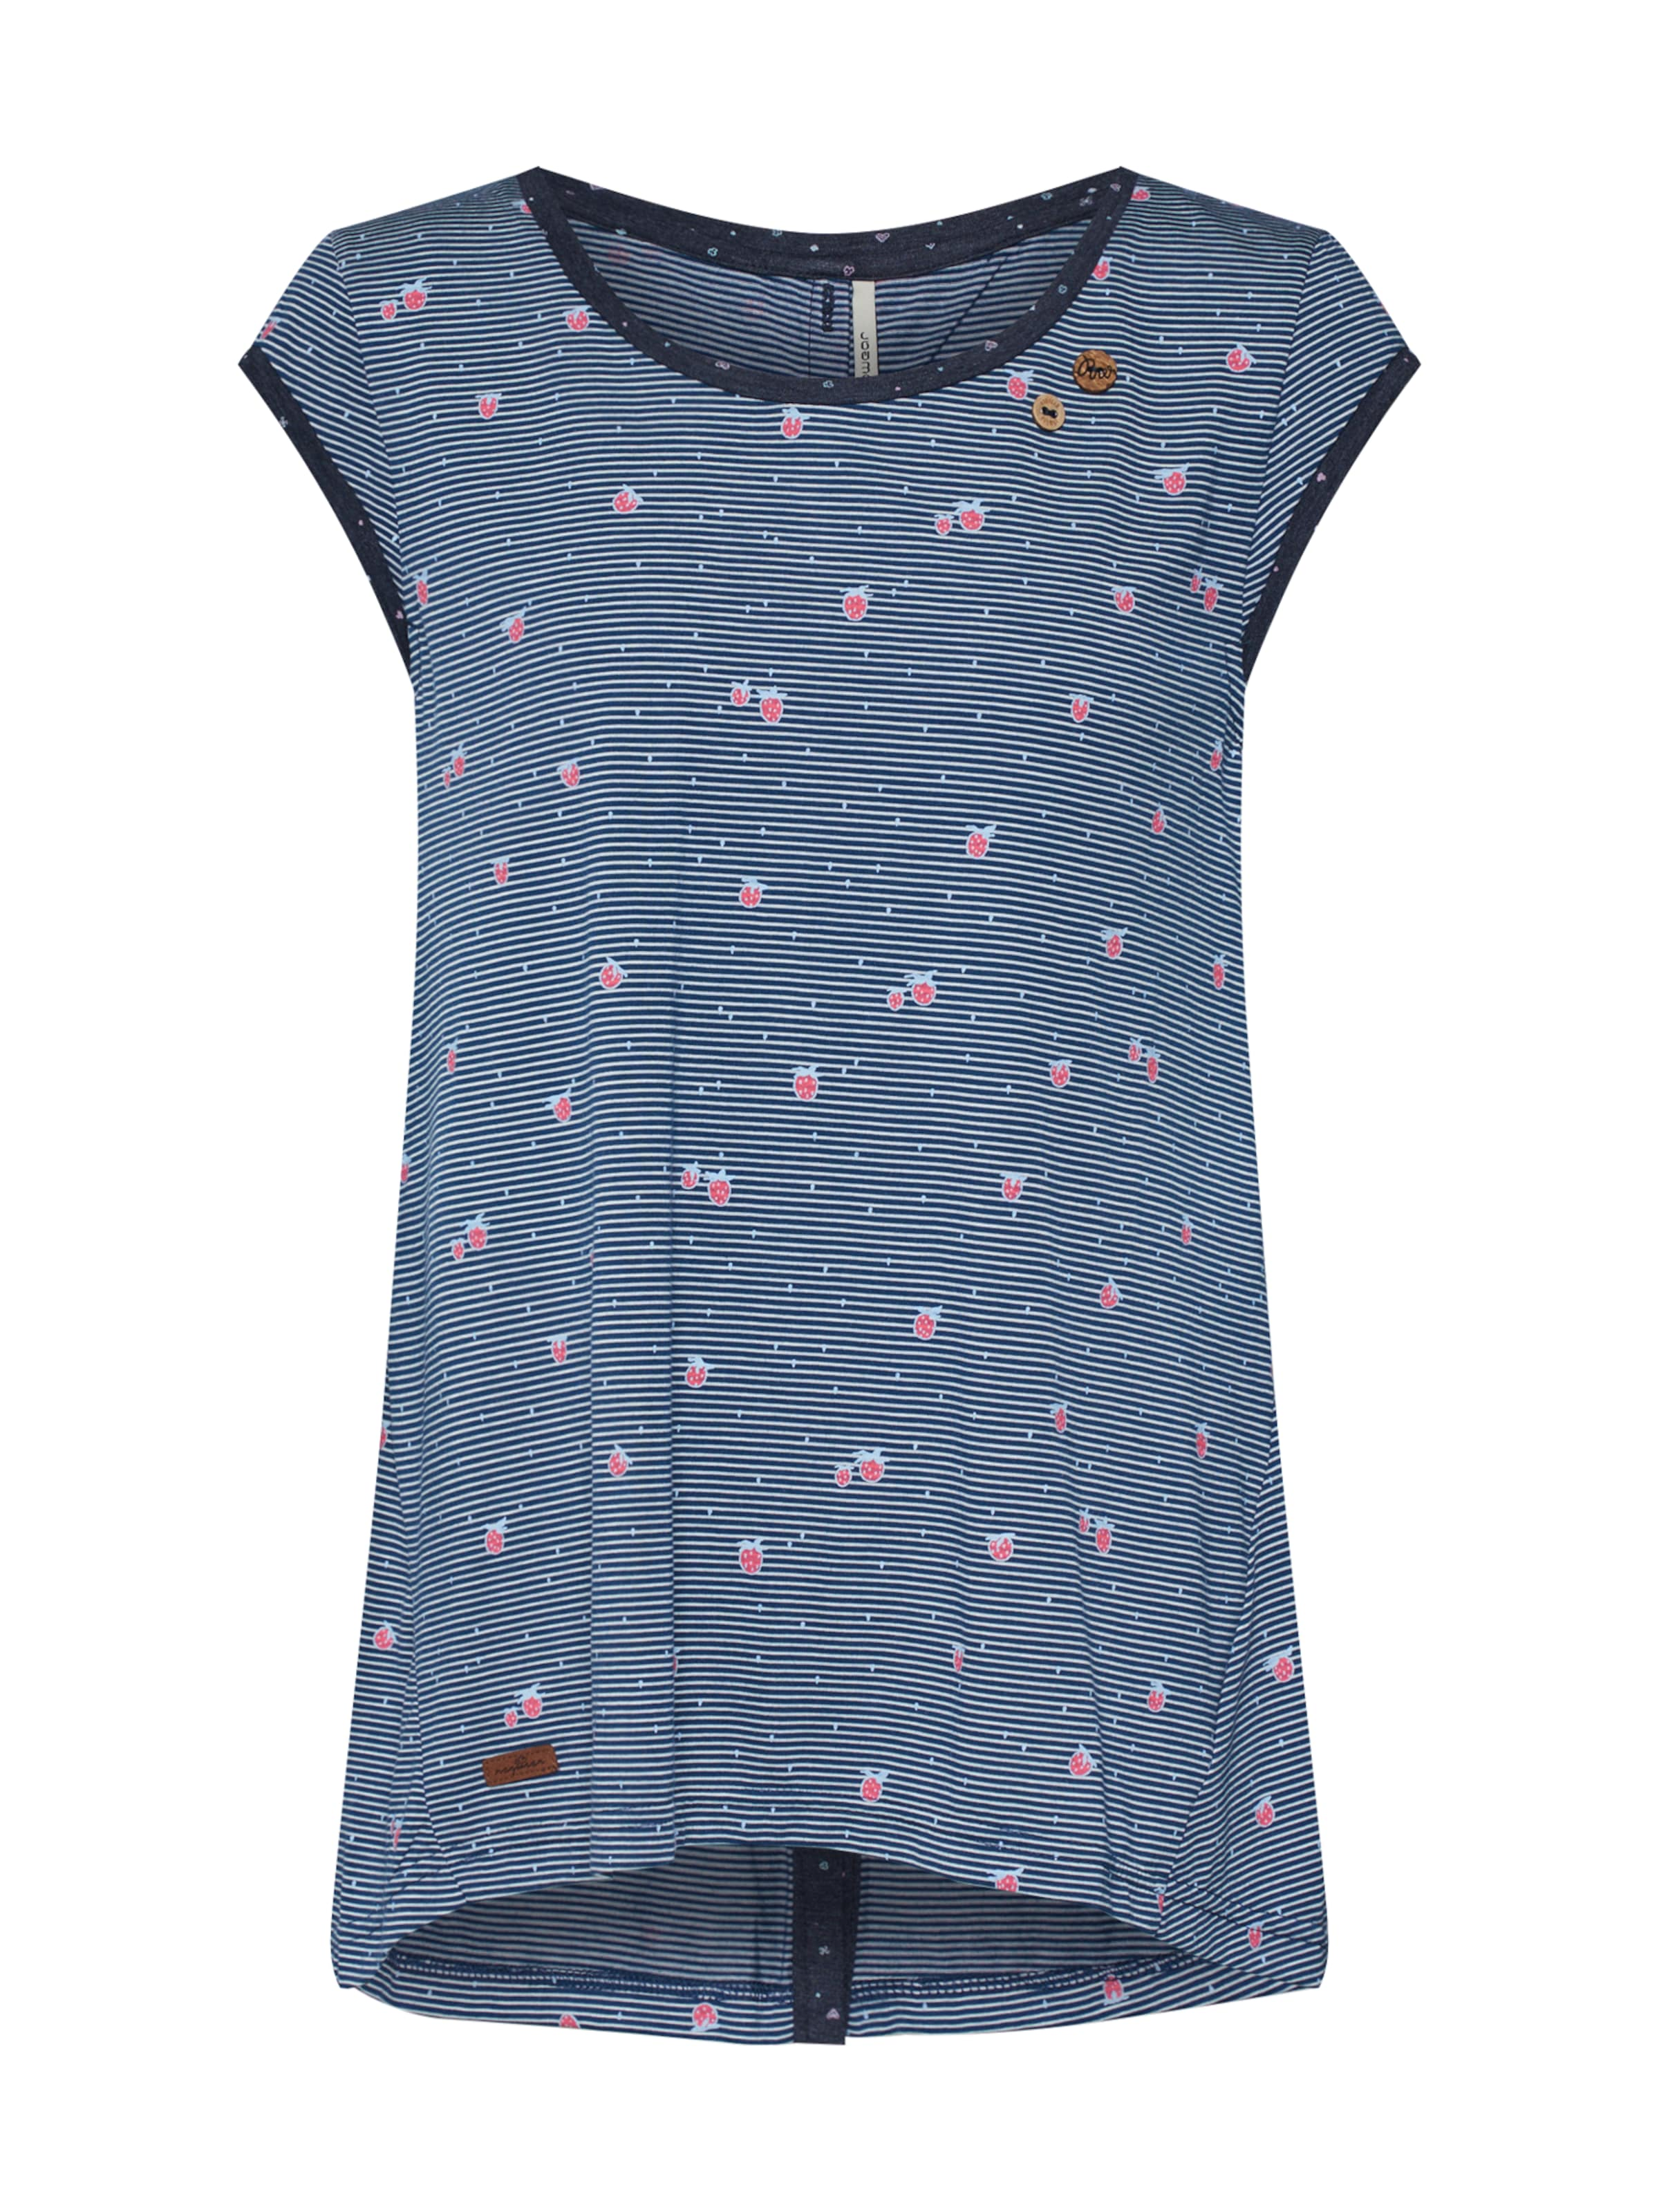 Blanc 'dominica' BleuRose En T shirt Ragwear 0Pwk8On